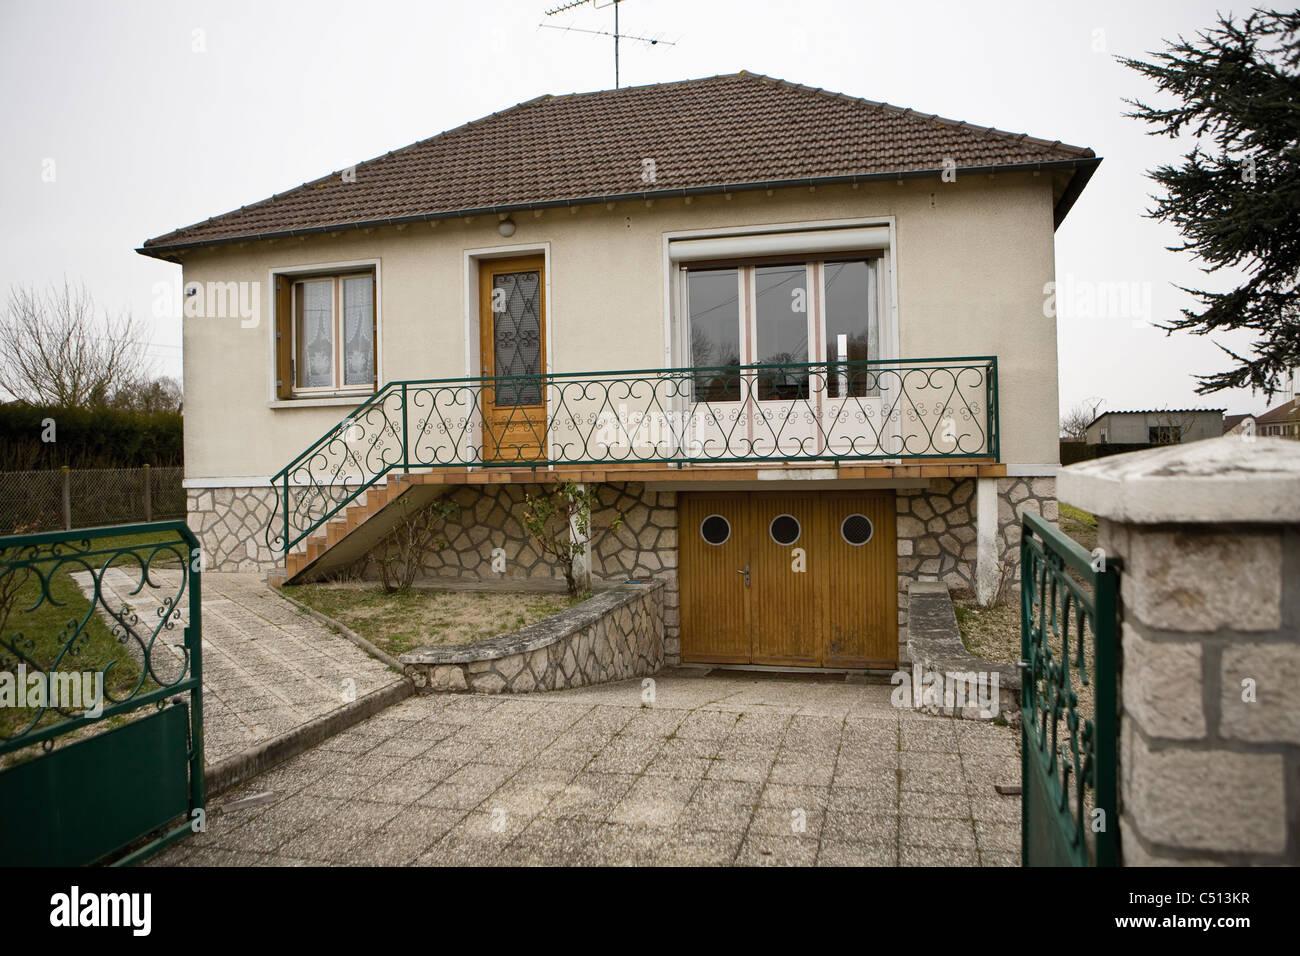 Stucco house - Stock Image